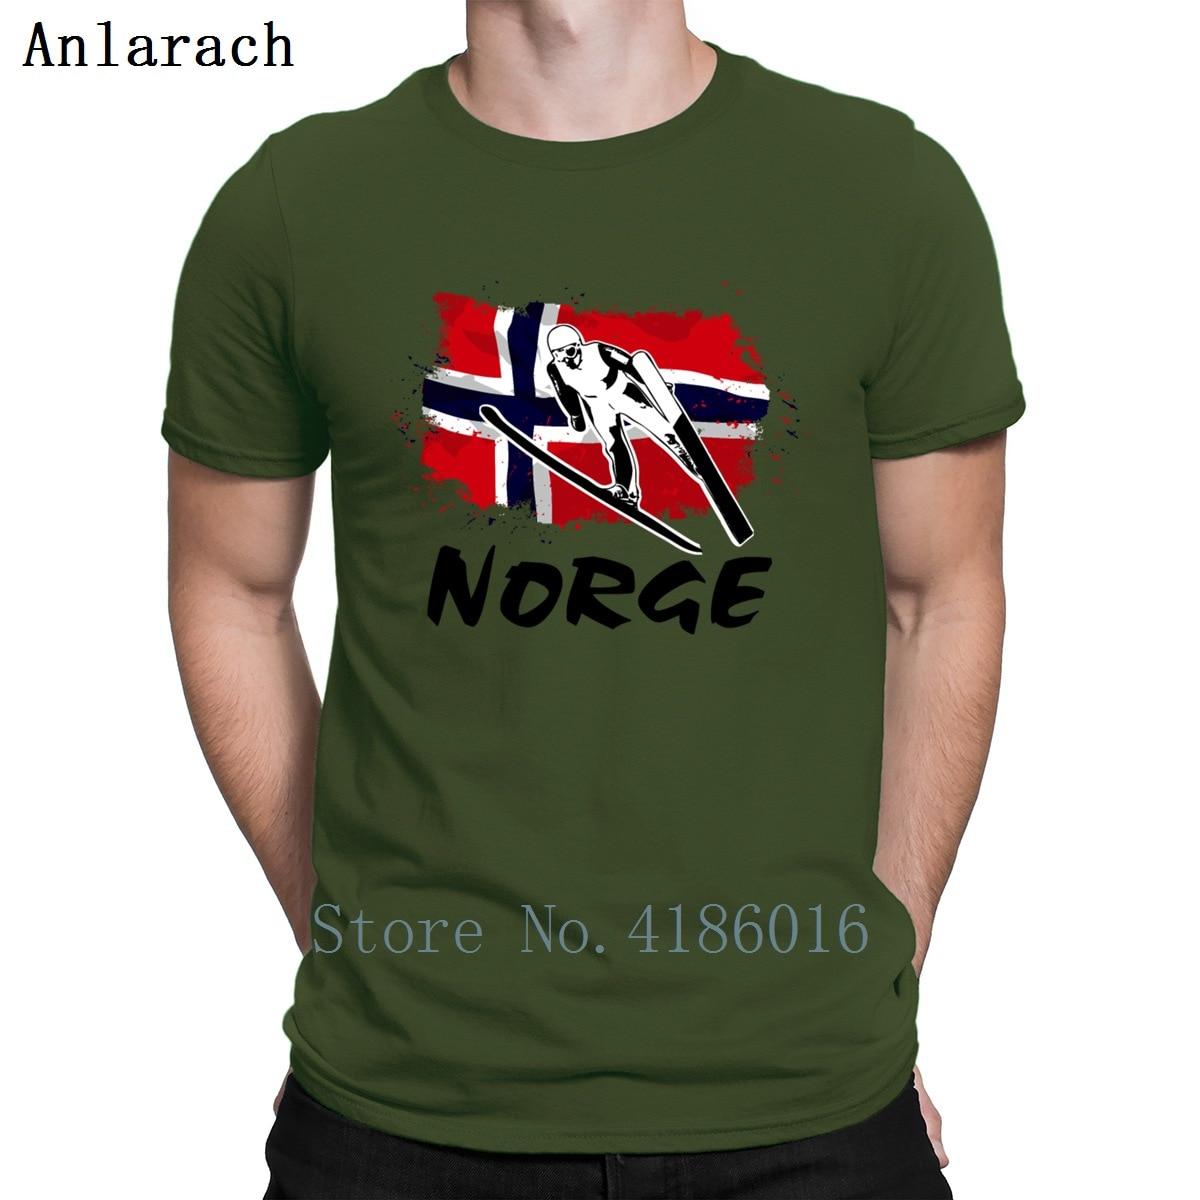 Cielo Jumpings Noruega bandera camisetas transpirables tejido Natural tamaño S-3xl hombres camiseta primavera Vintage manga corta Hiphop Tops